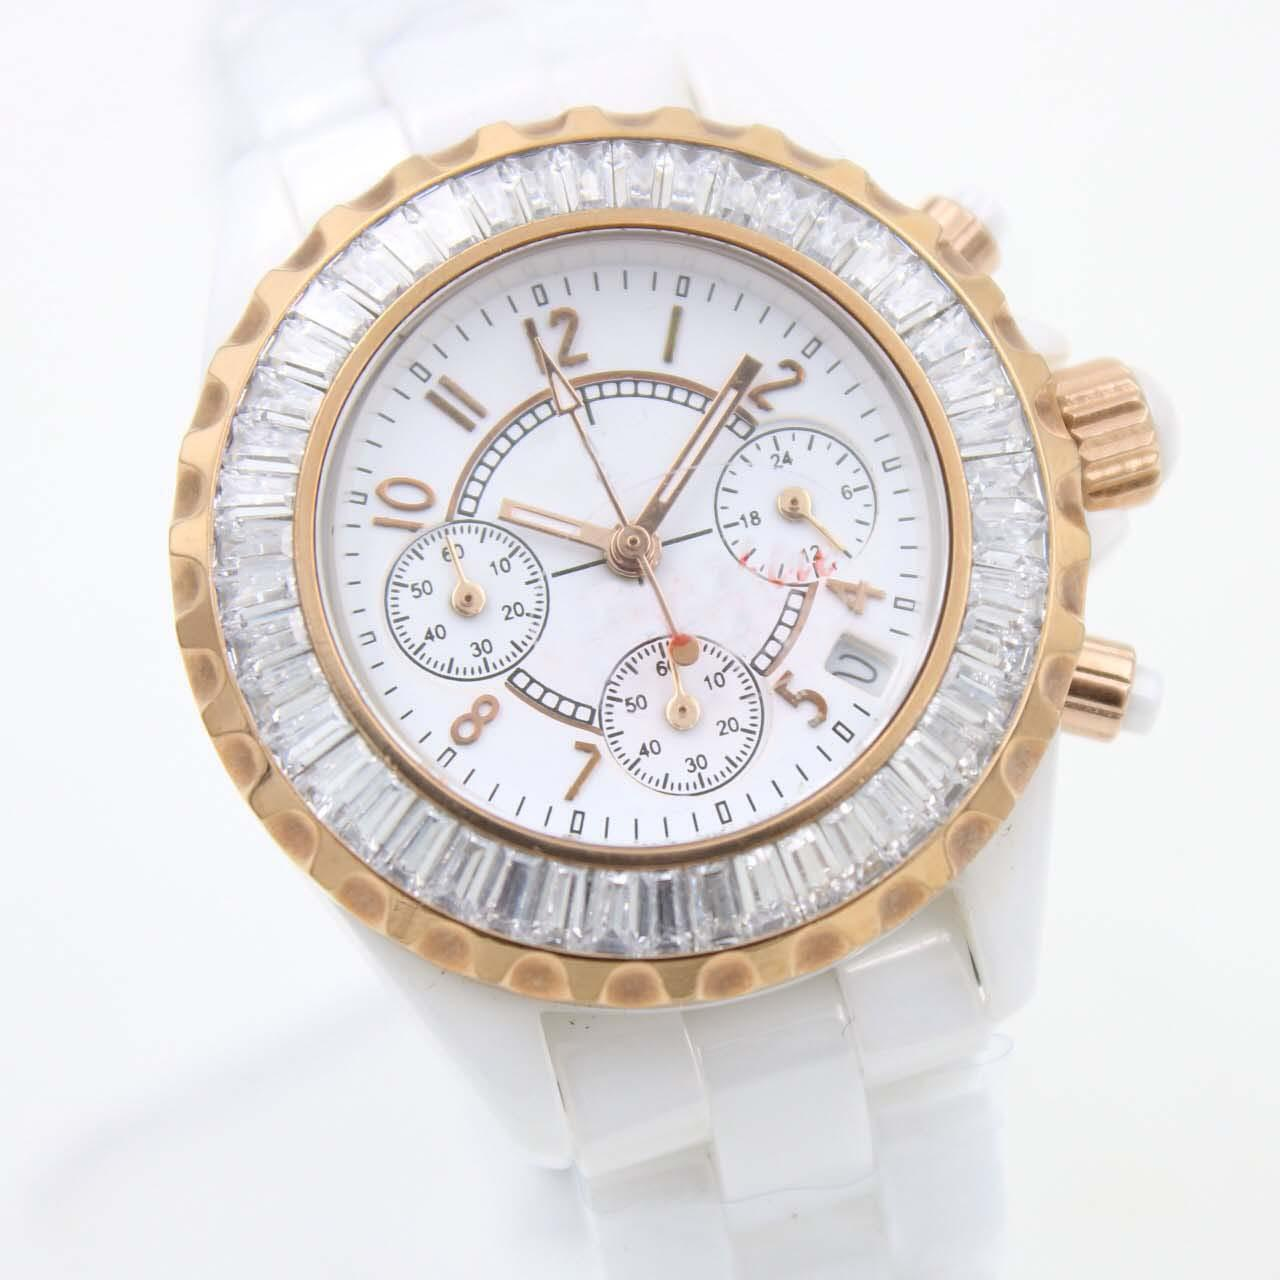 Wholesale - NEW LUXURY 34mm watches quality quartz chronograph movement DIAMOND DIAL movement ceramic watch WHITE bezel fashion ladies watch